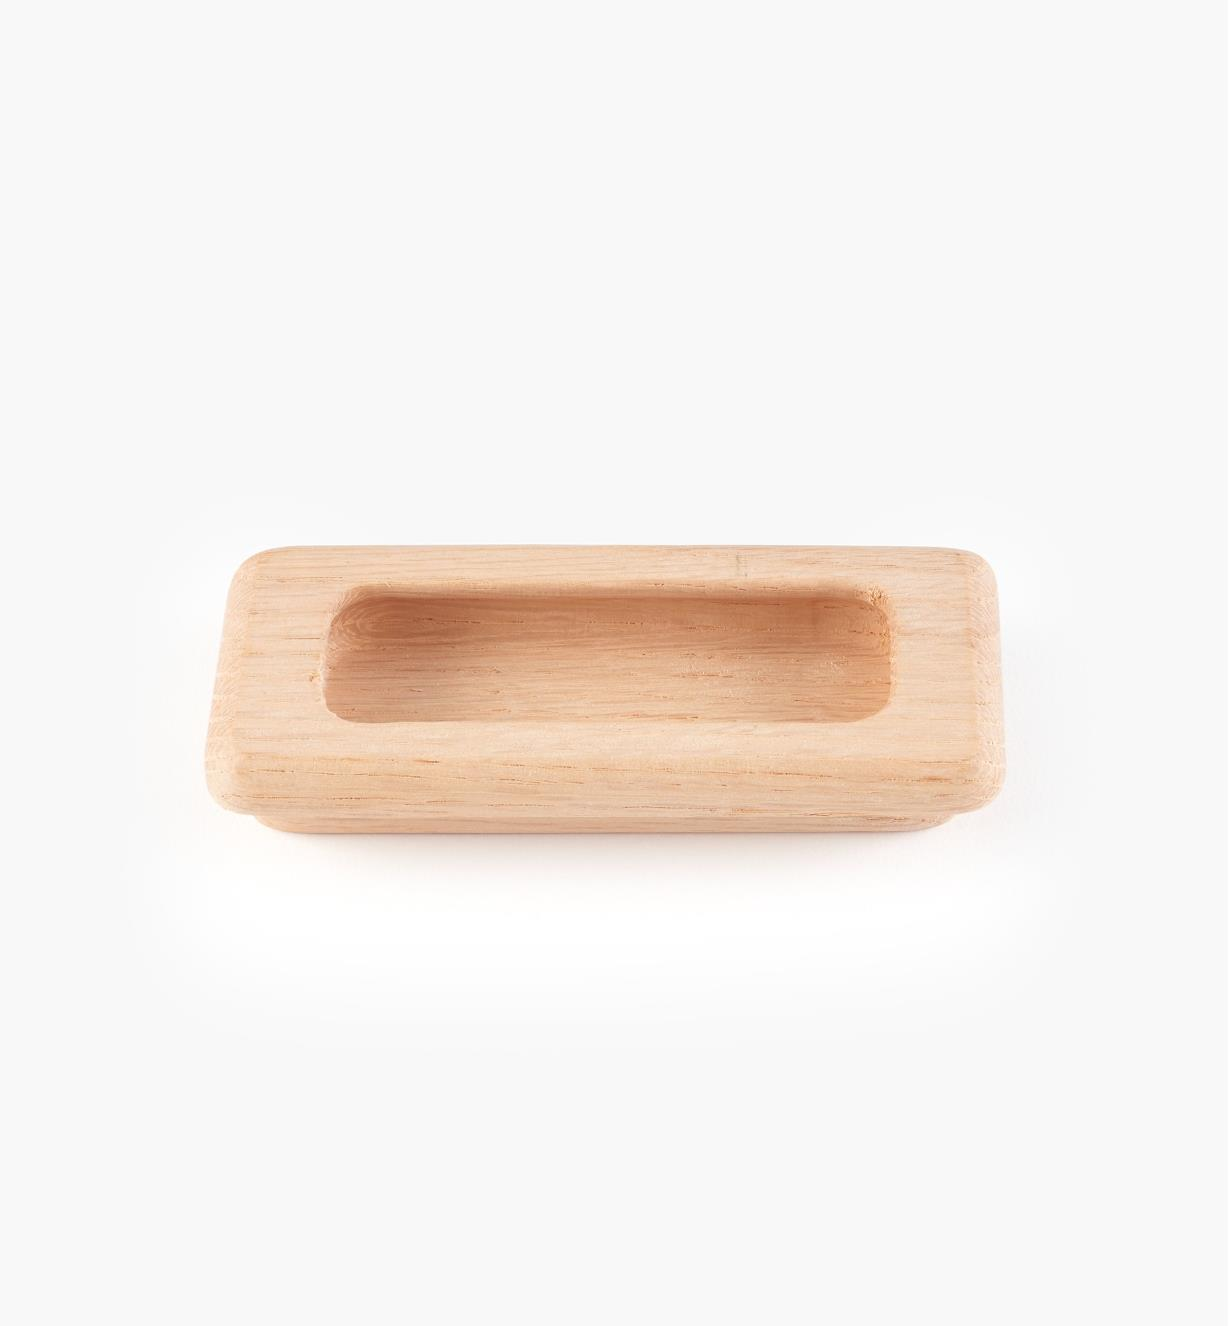 02G1305 - Red Oak Pull